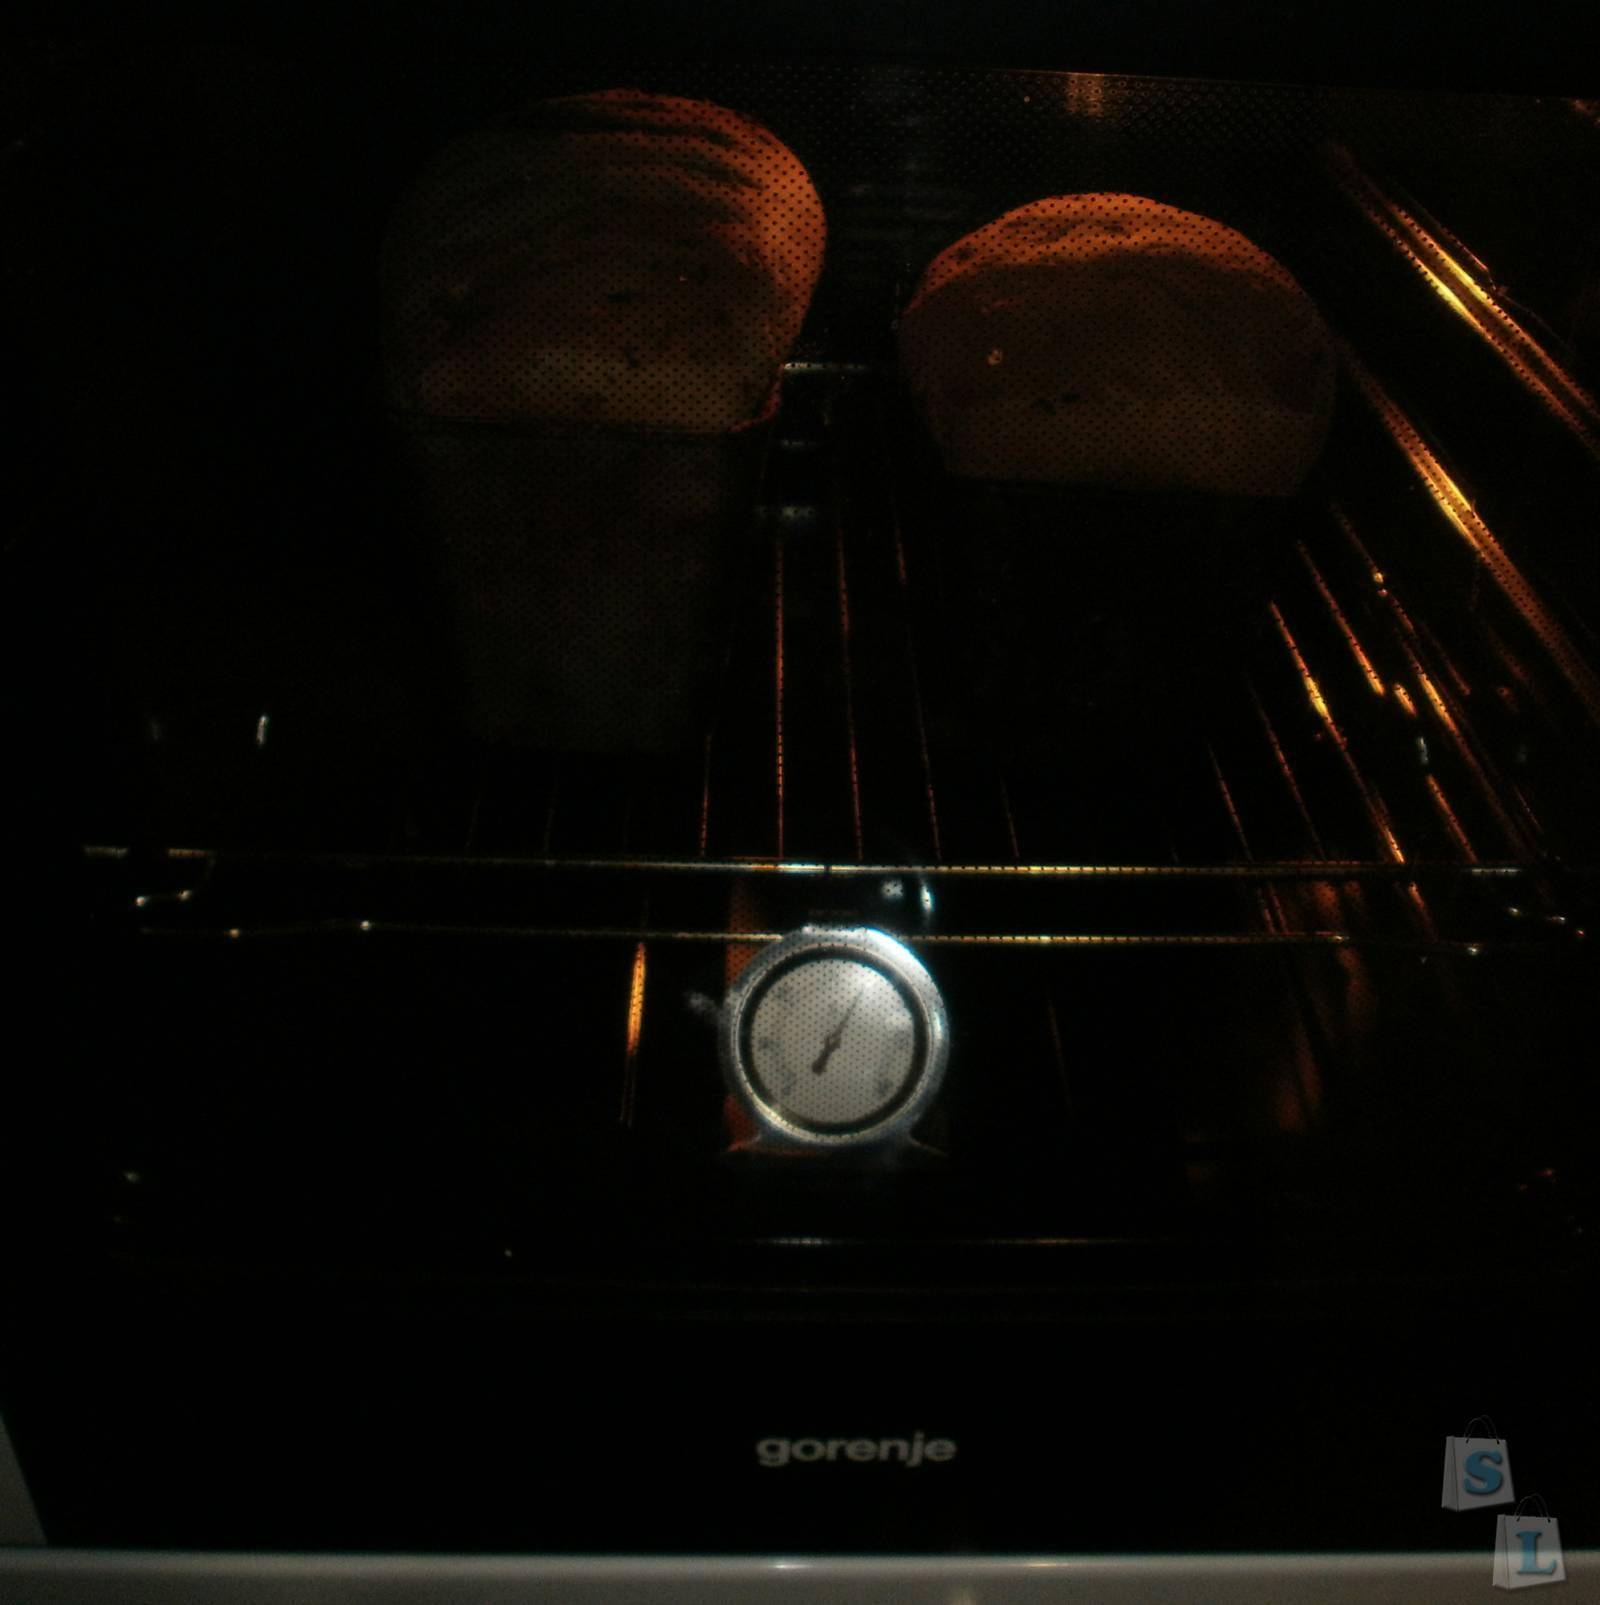 Aliexpress: Биметаллический термометр для духовки до 300°C